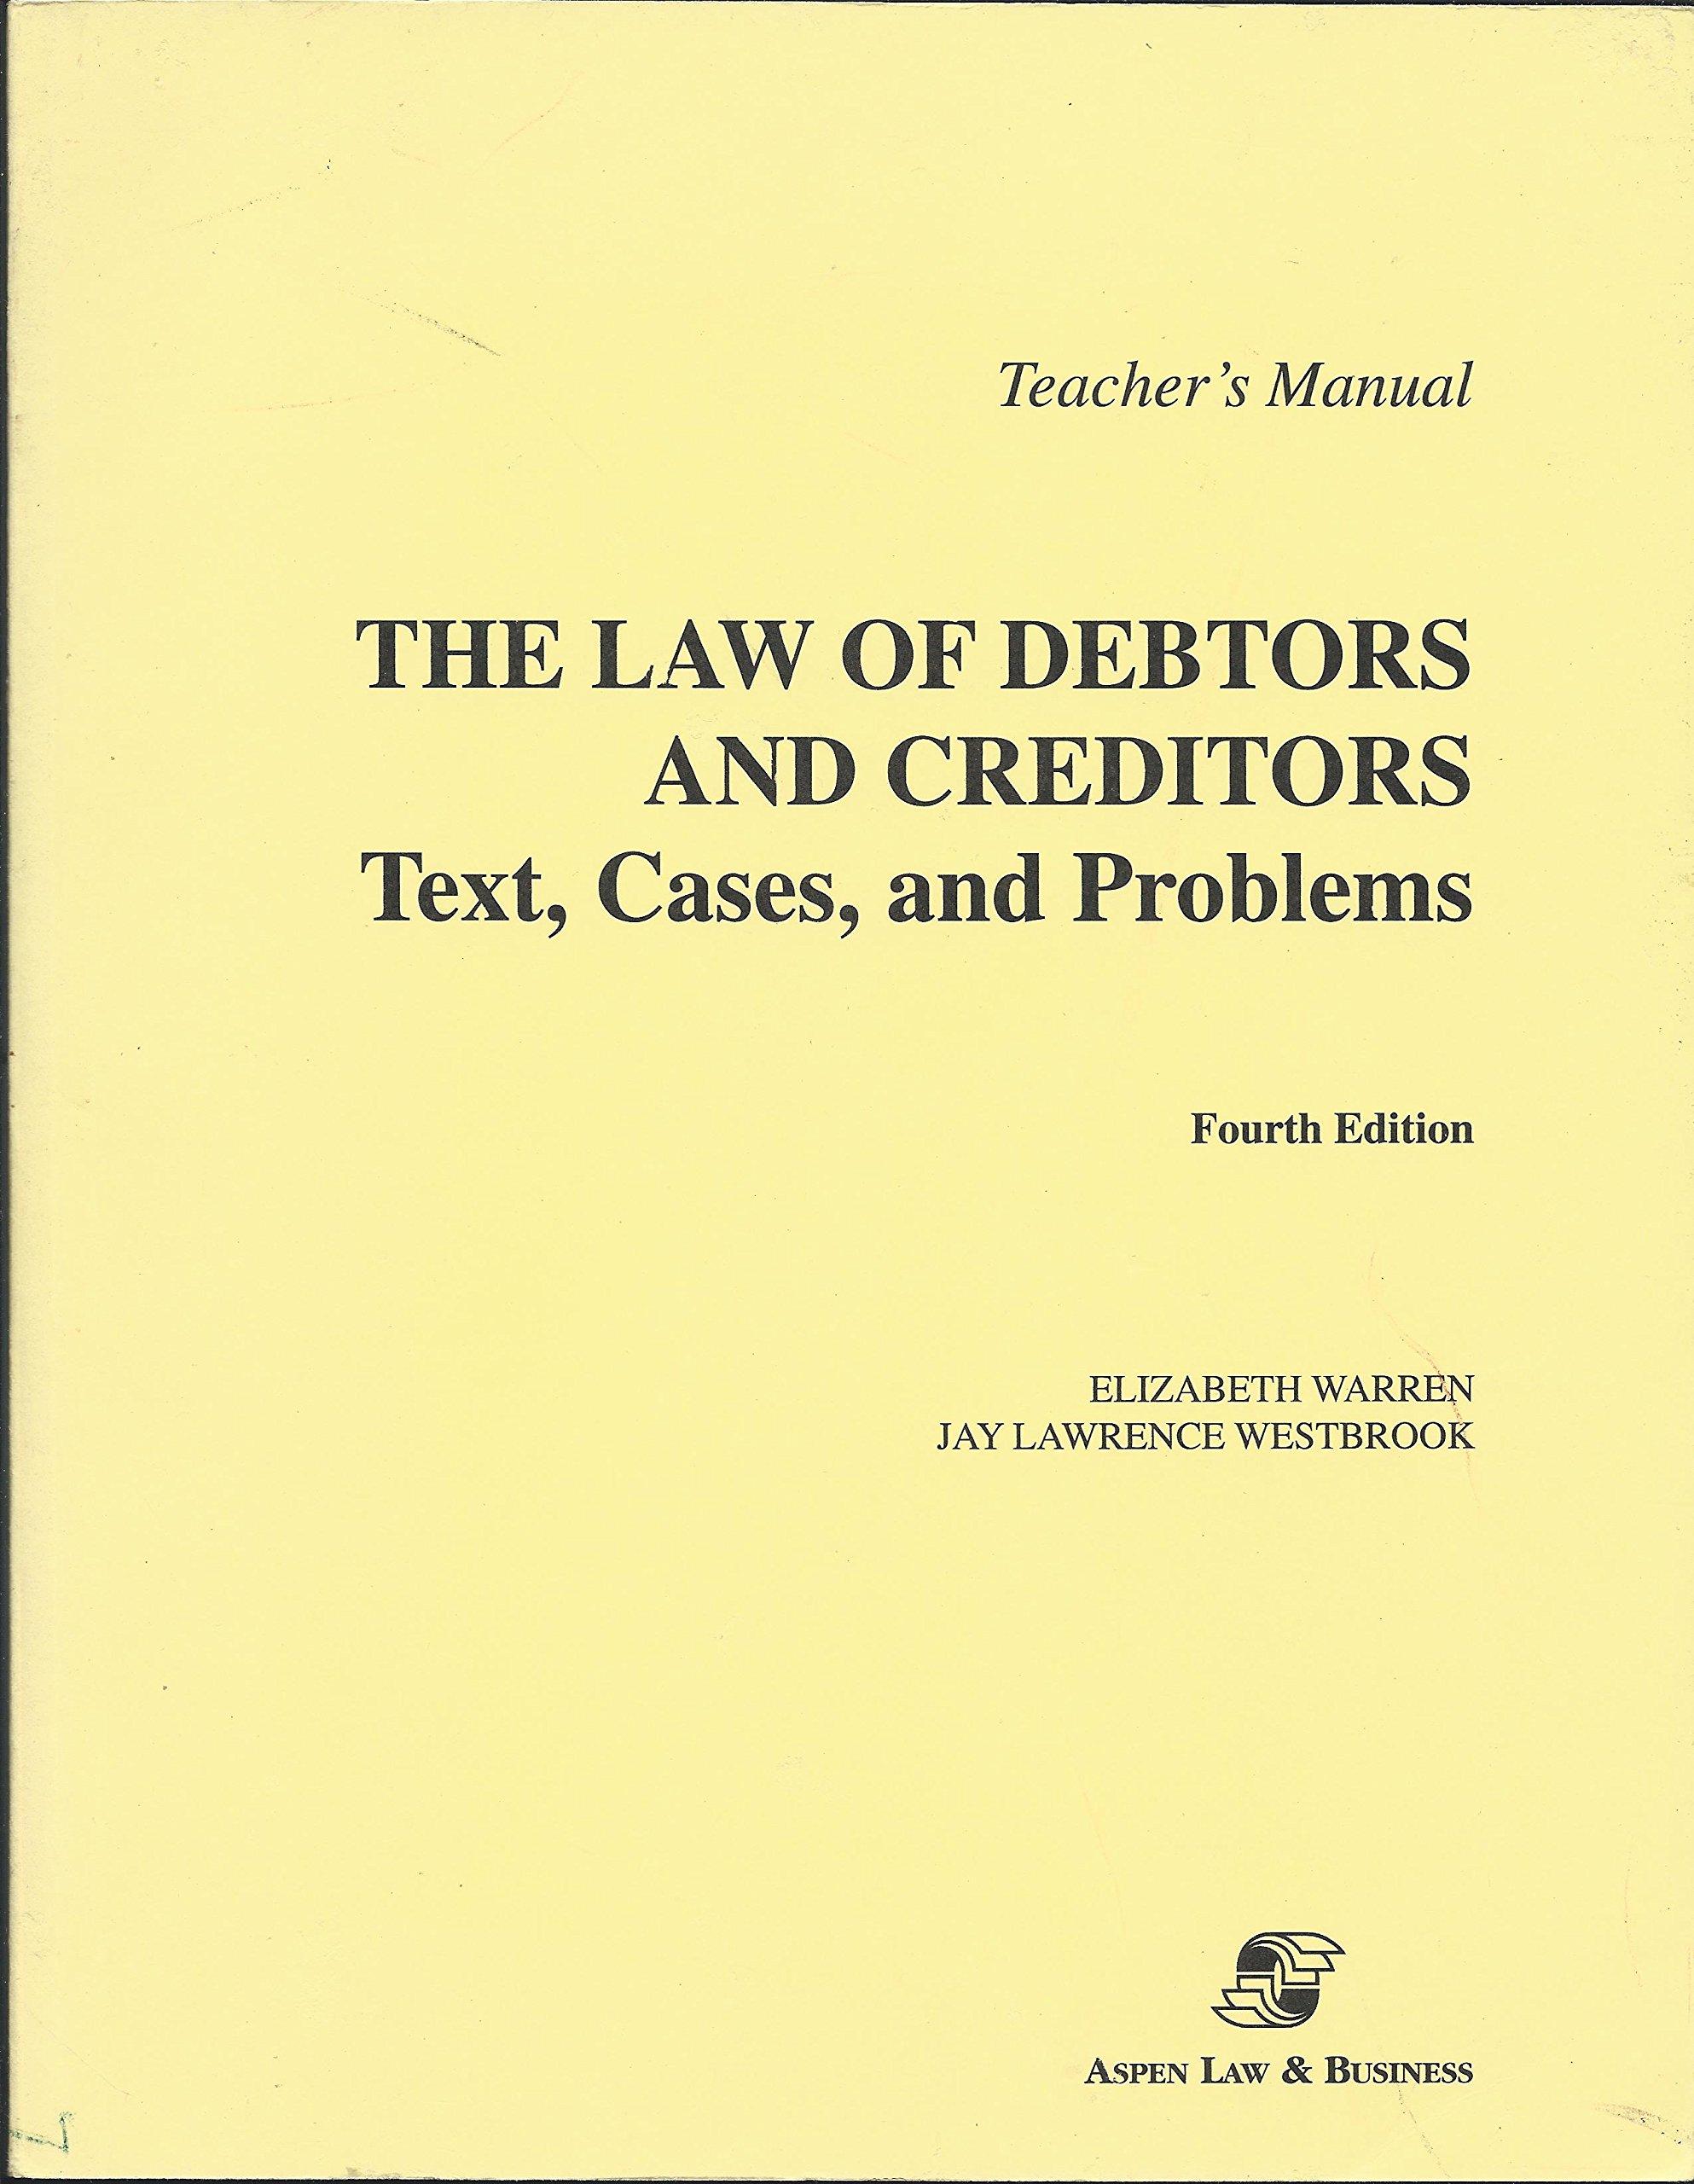 Law of debtors and creditors elizabeth warren jay lawrence law of debtors and creditors elizabeth warren jay lawrence westbrook 9780735520219 amazon books fandeluxe Images